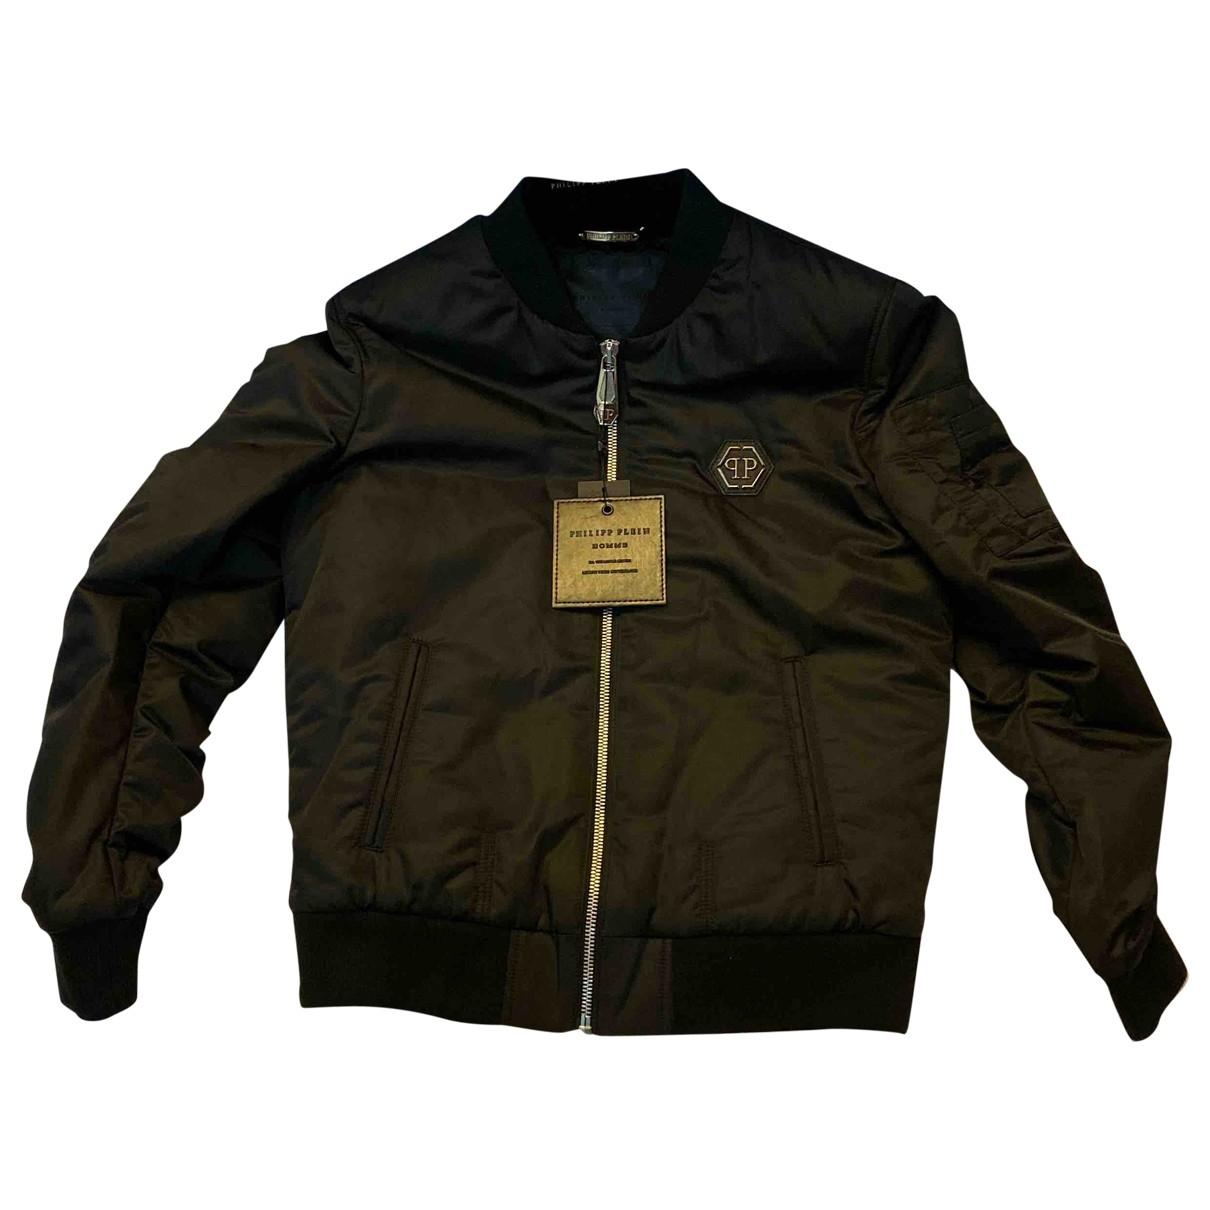 Philipp Plein \N Black jacket  for Men M International